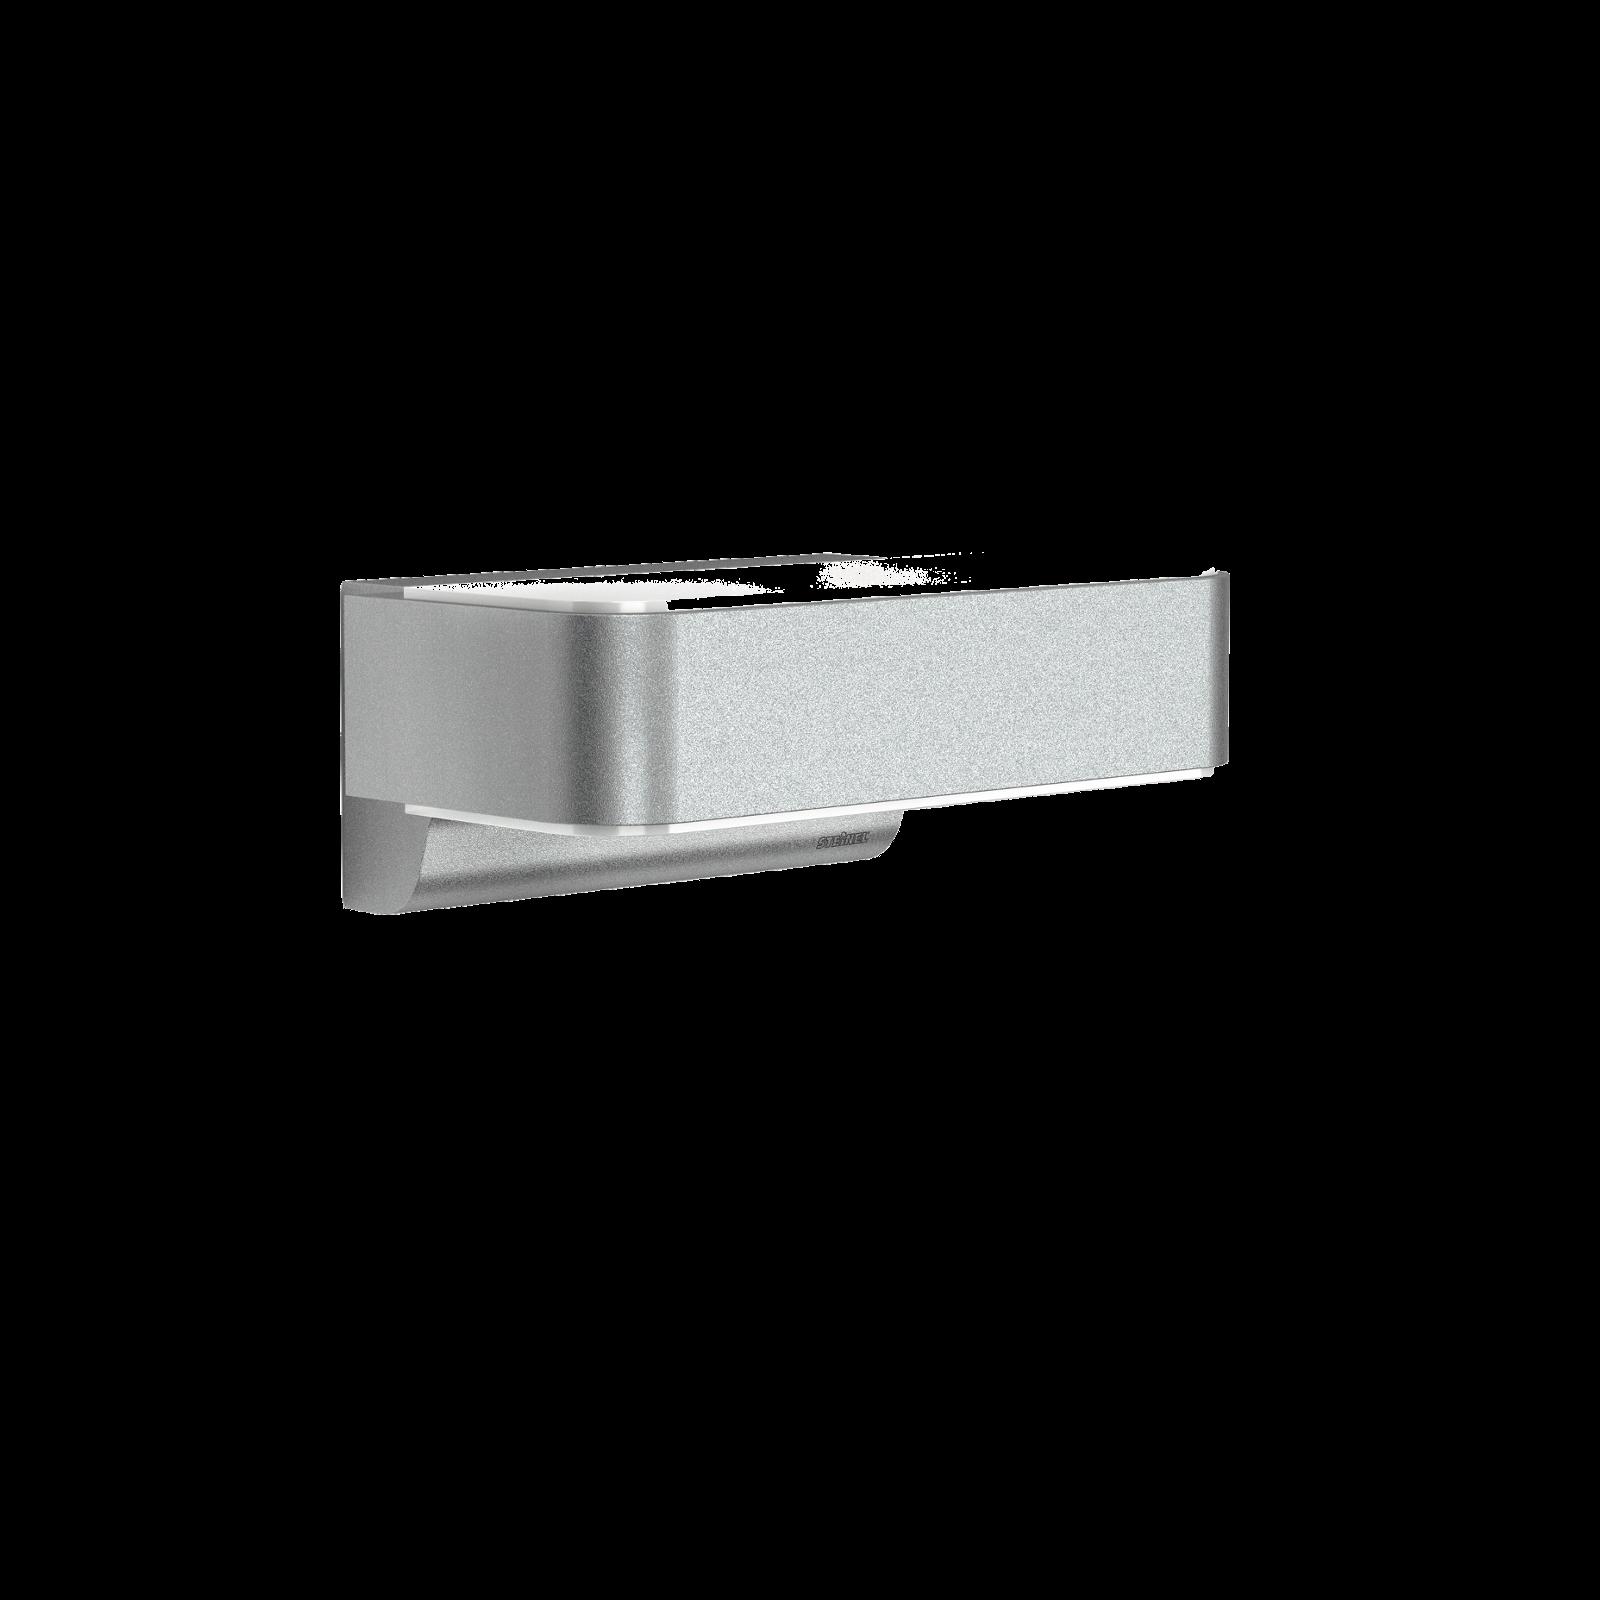 Steinel L 810 iHF Sensor-LED-Wandleuchte, Up-/Downlight